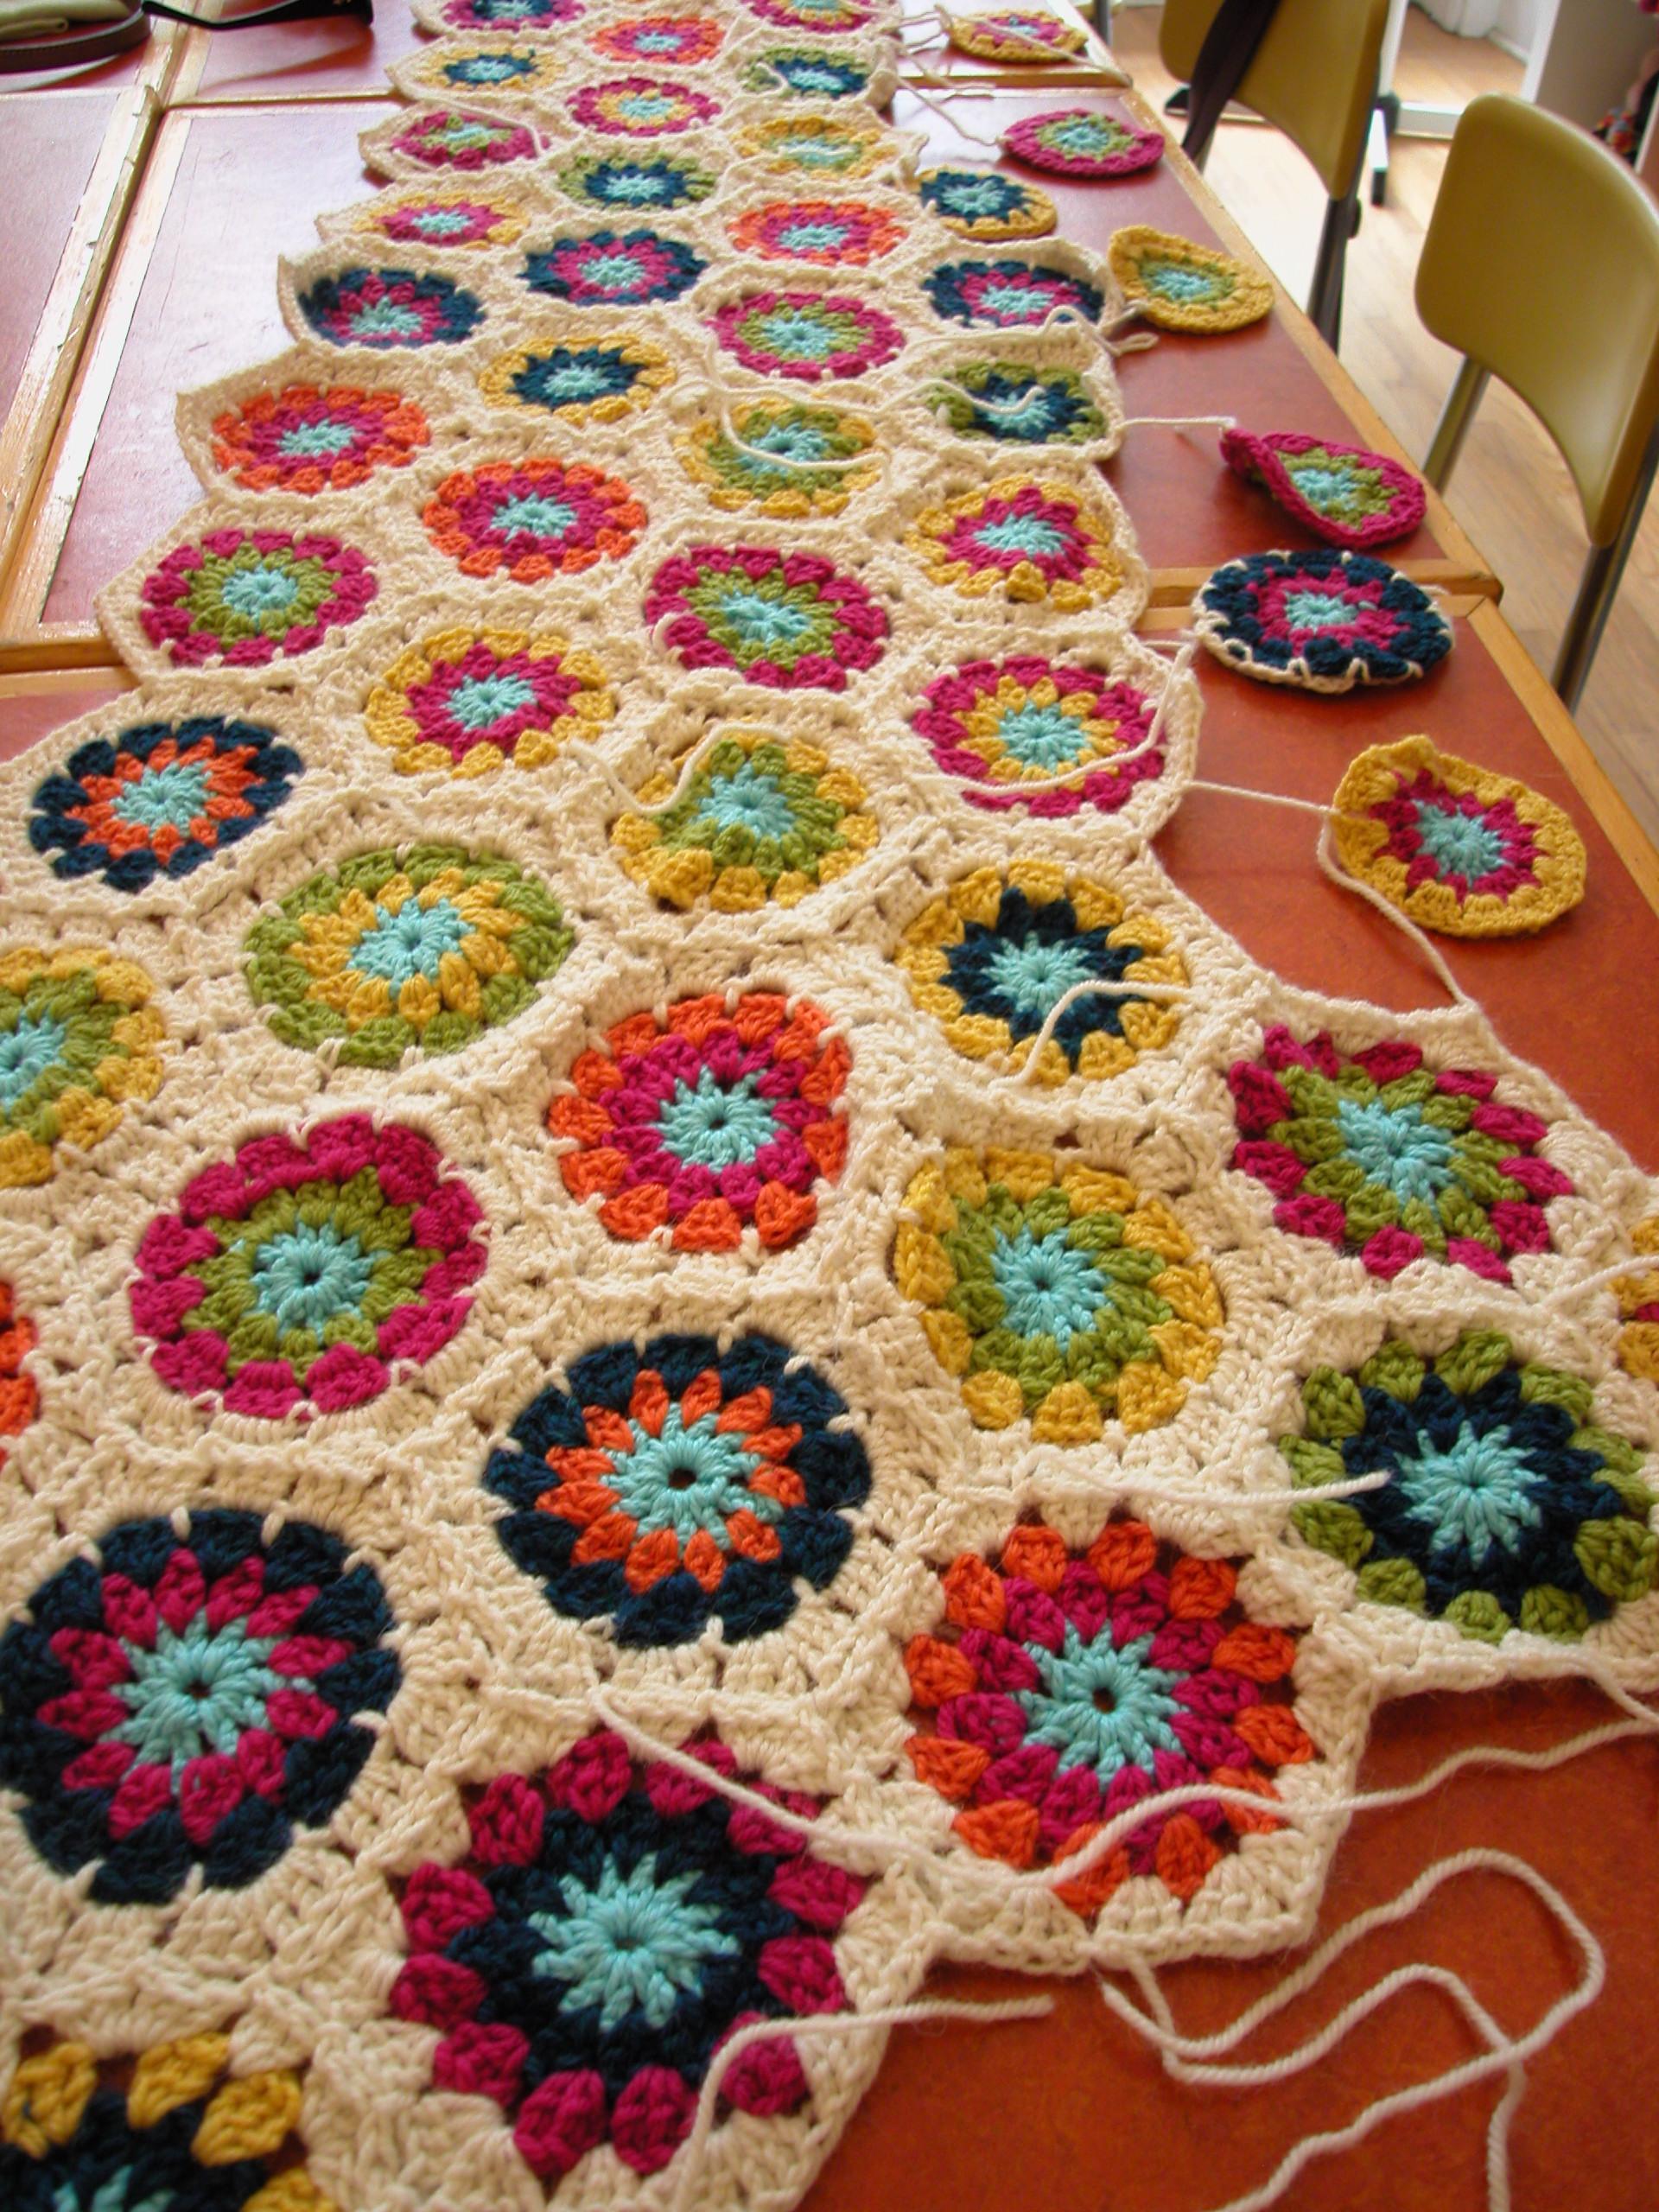 Crochet Patterns For A Blanket : crochet blanket the knit cafe